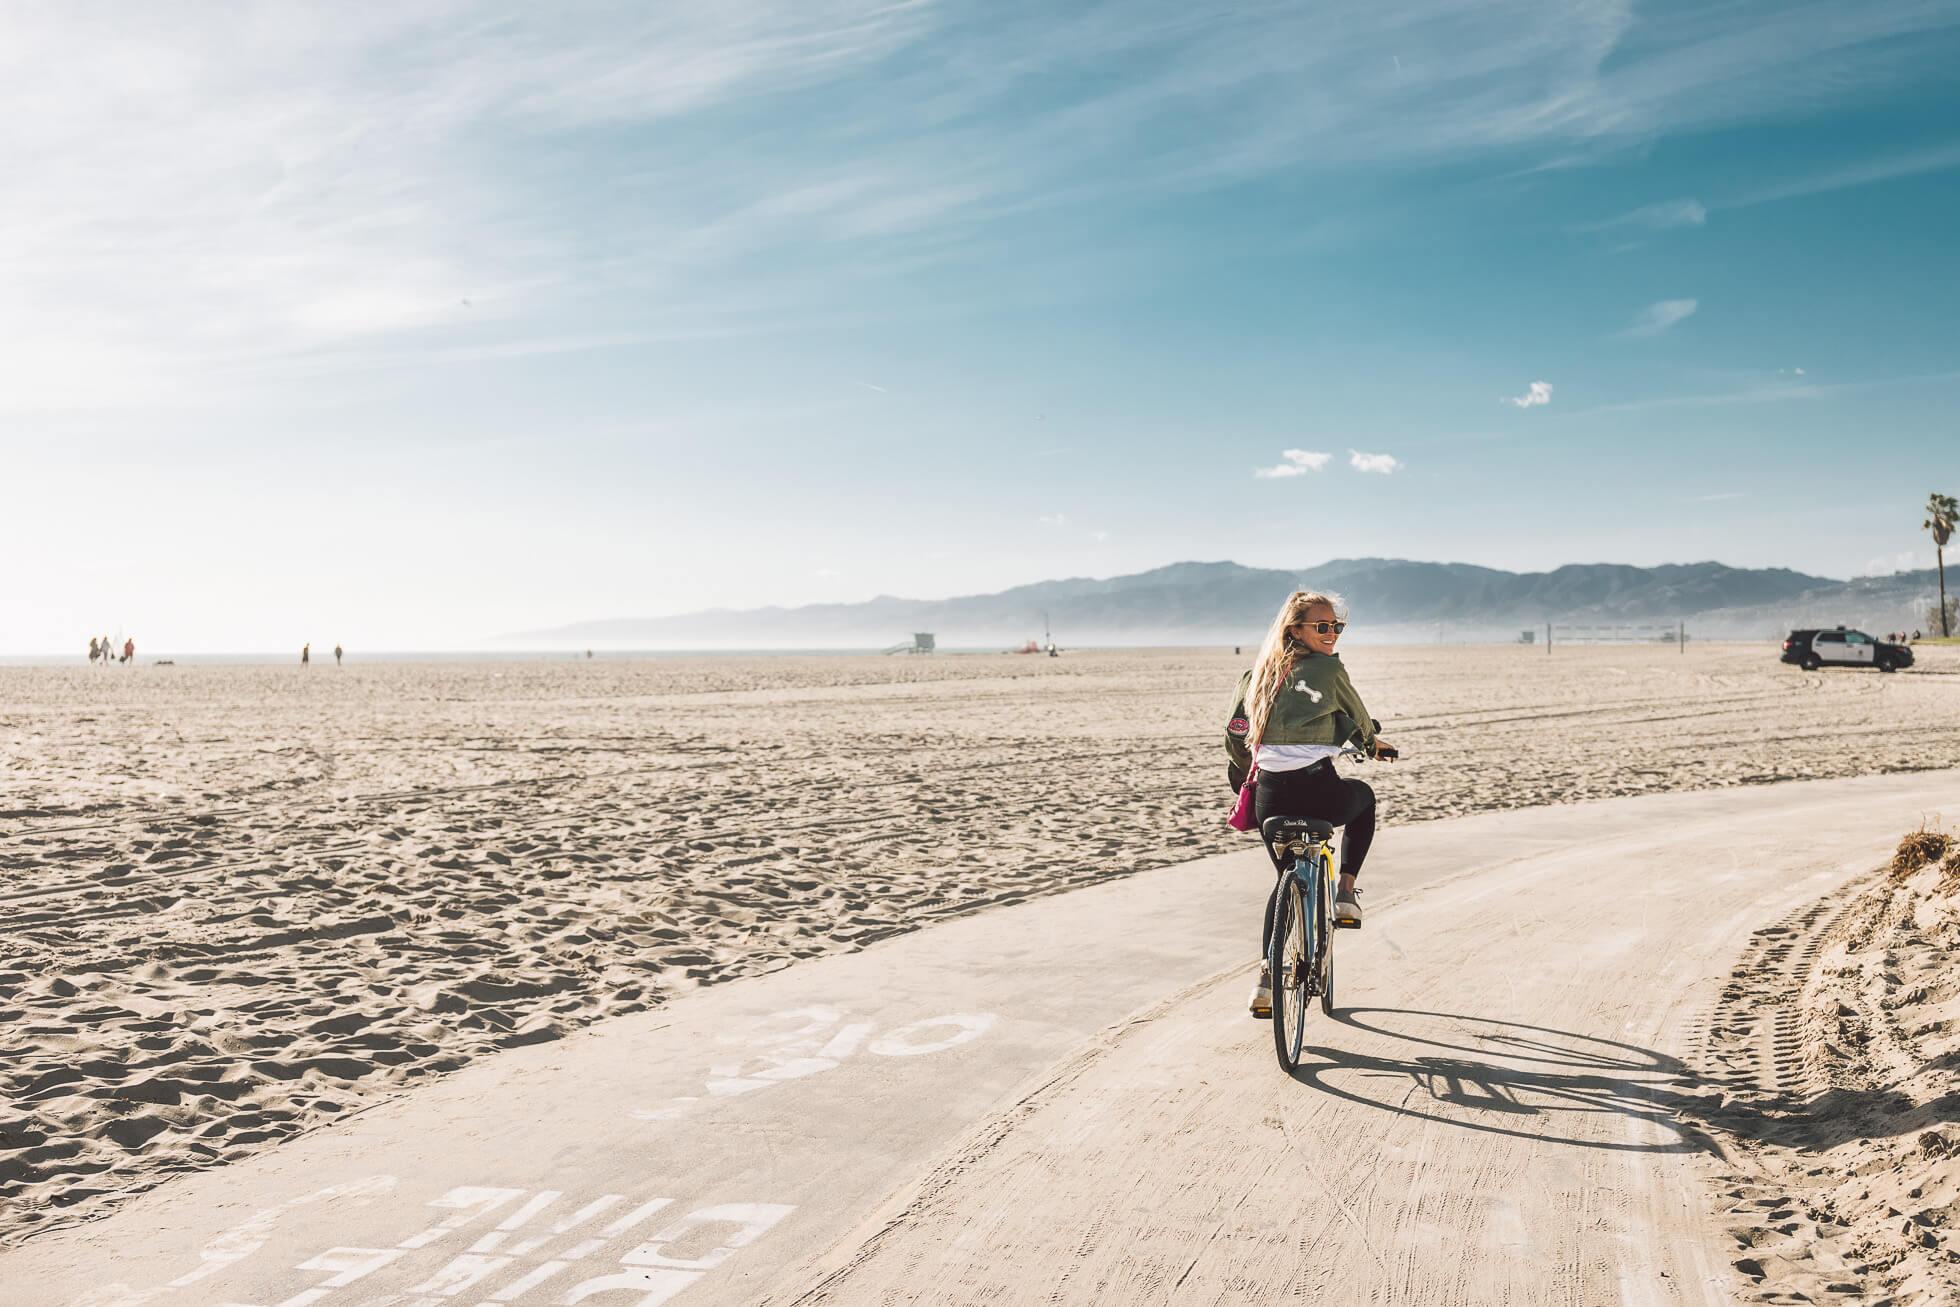 janni-deler-bike-ride-veniceL1010562